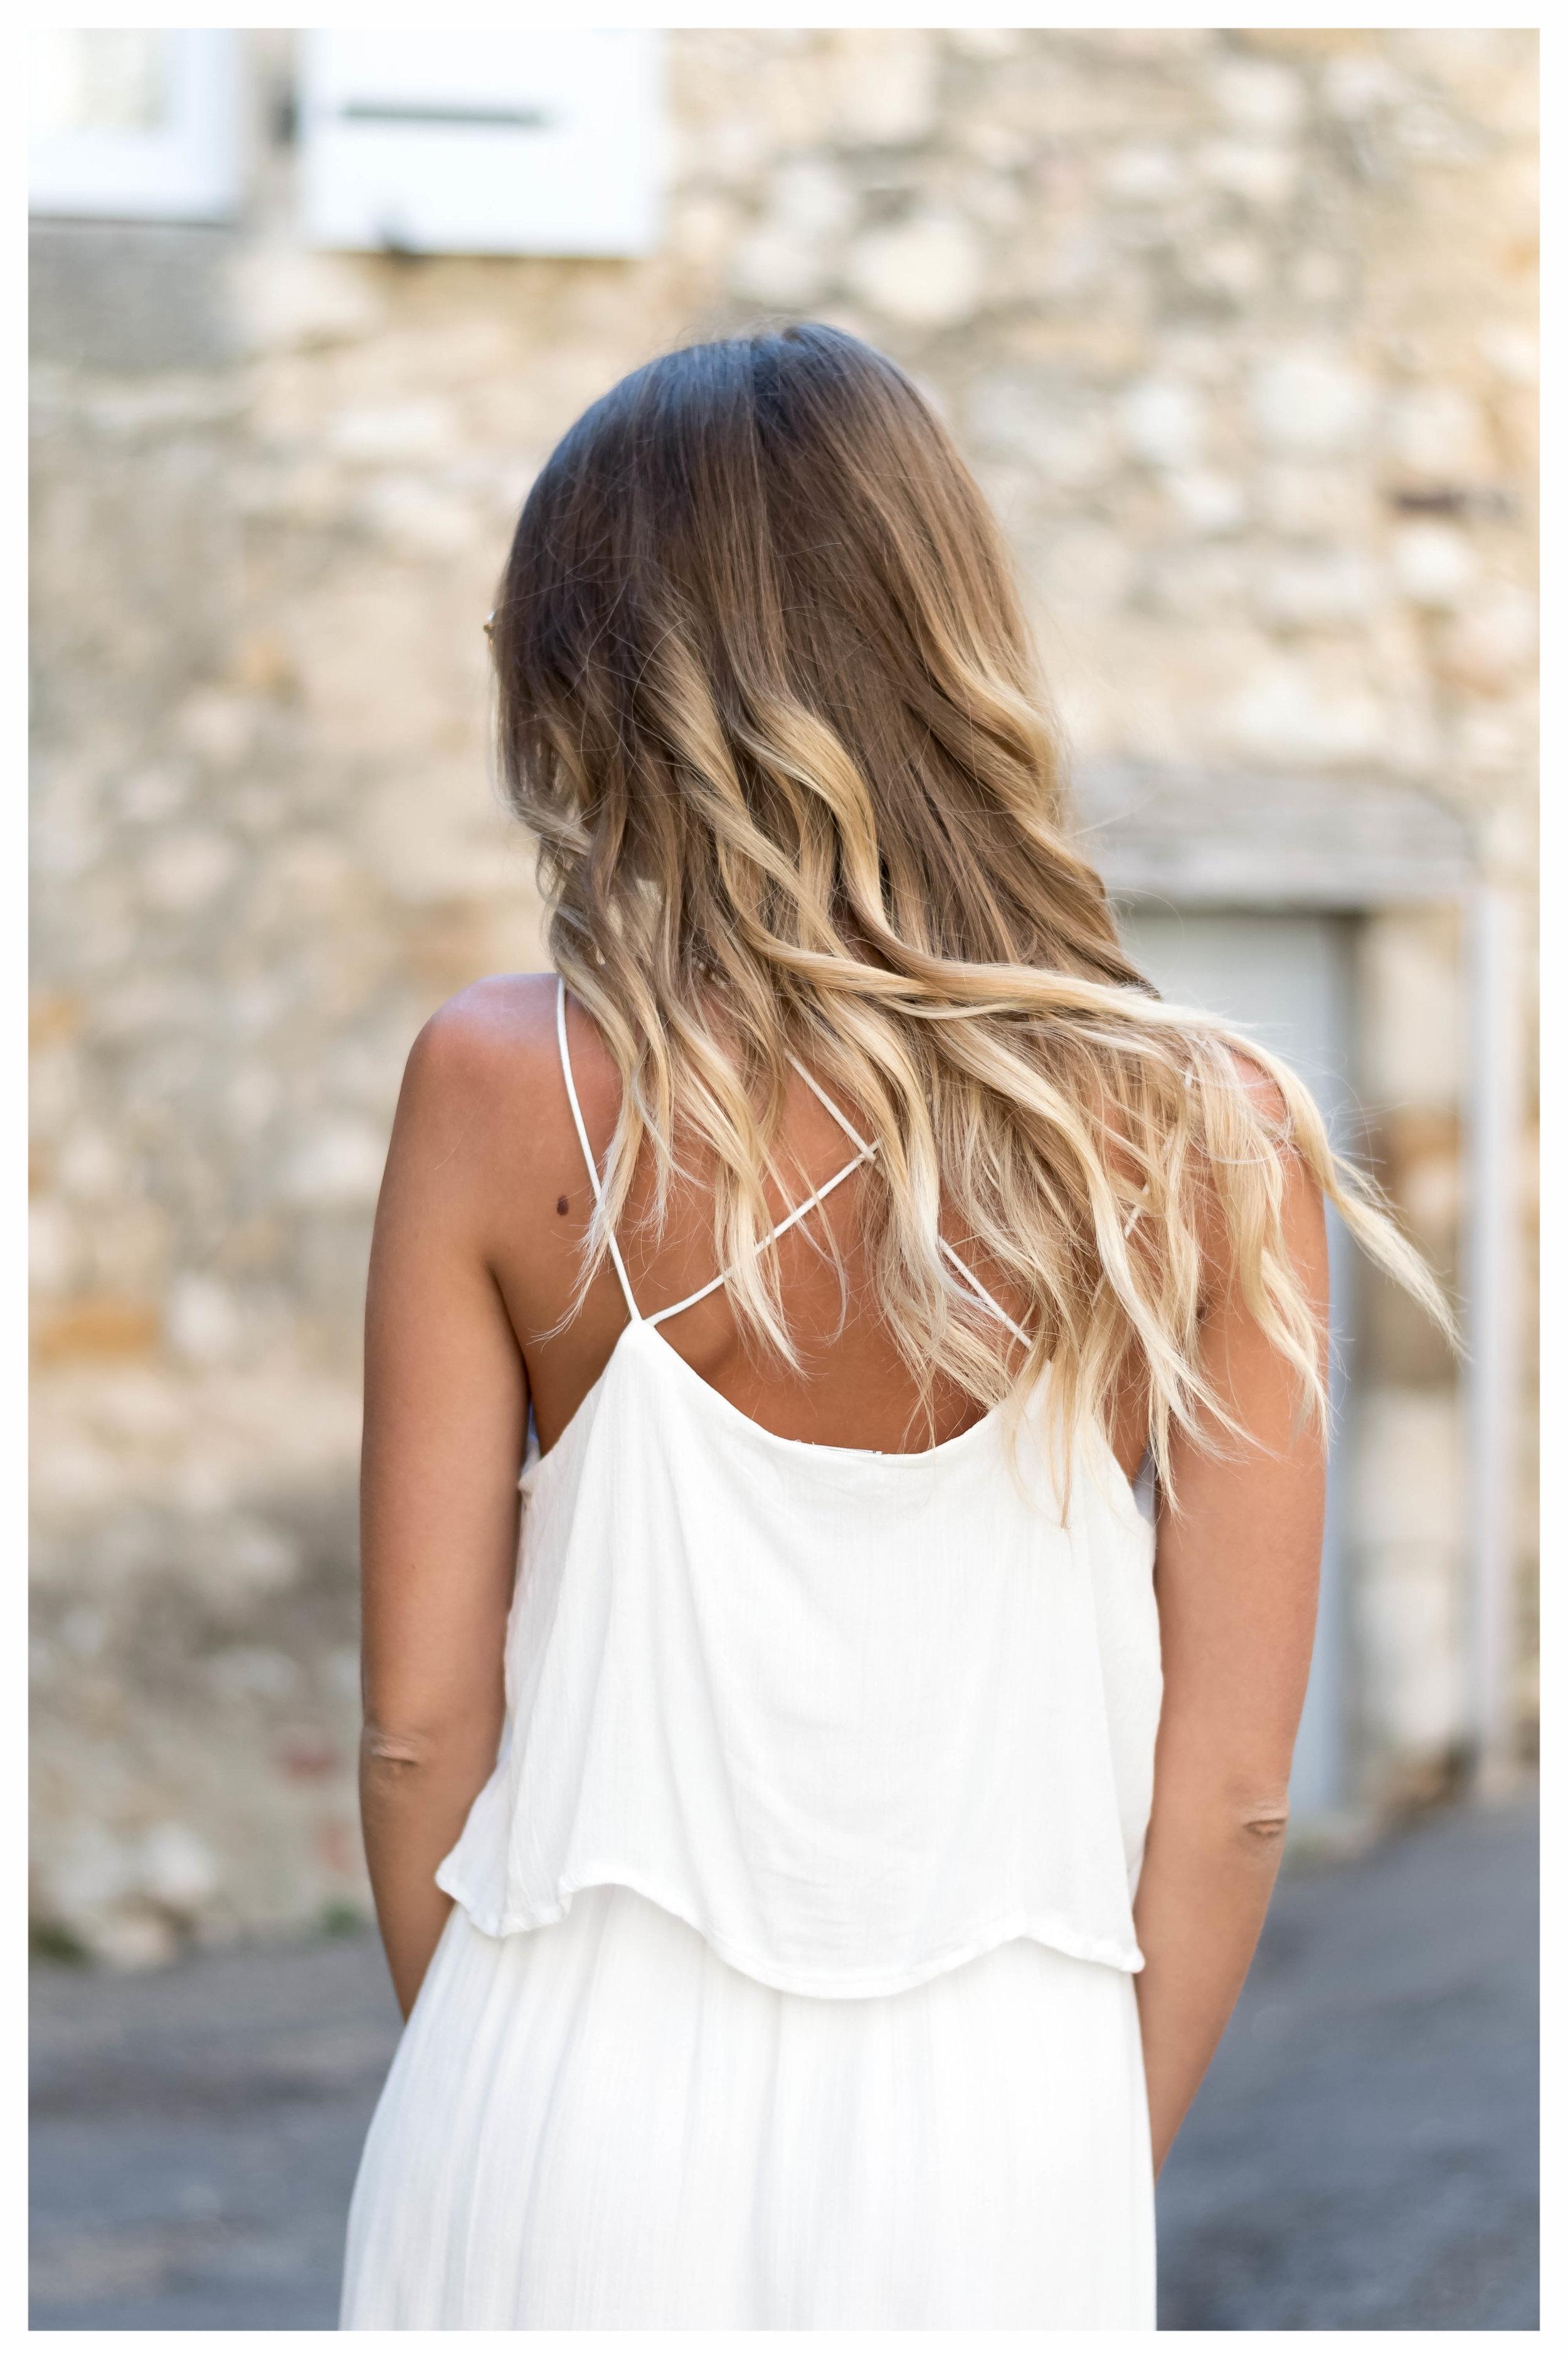 White Dress - OSIARAH.COM (13 sur 16).jpg